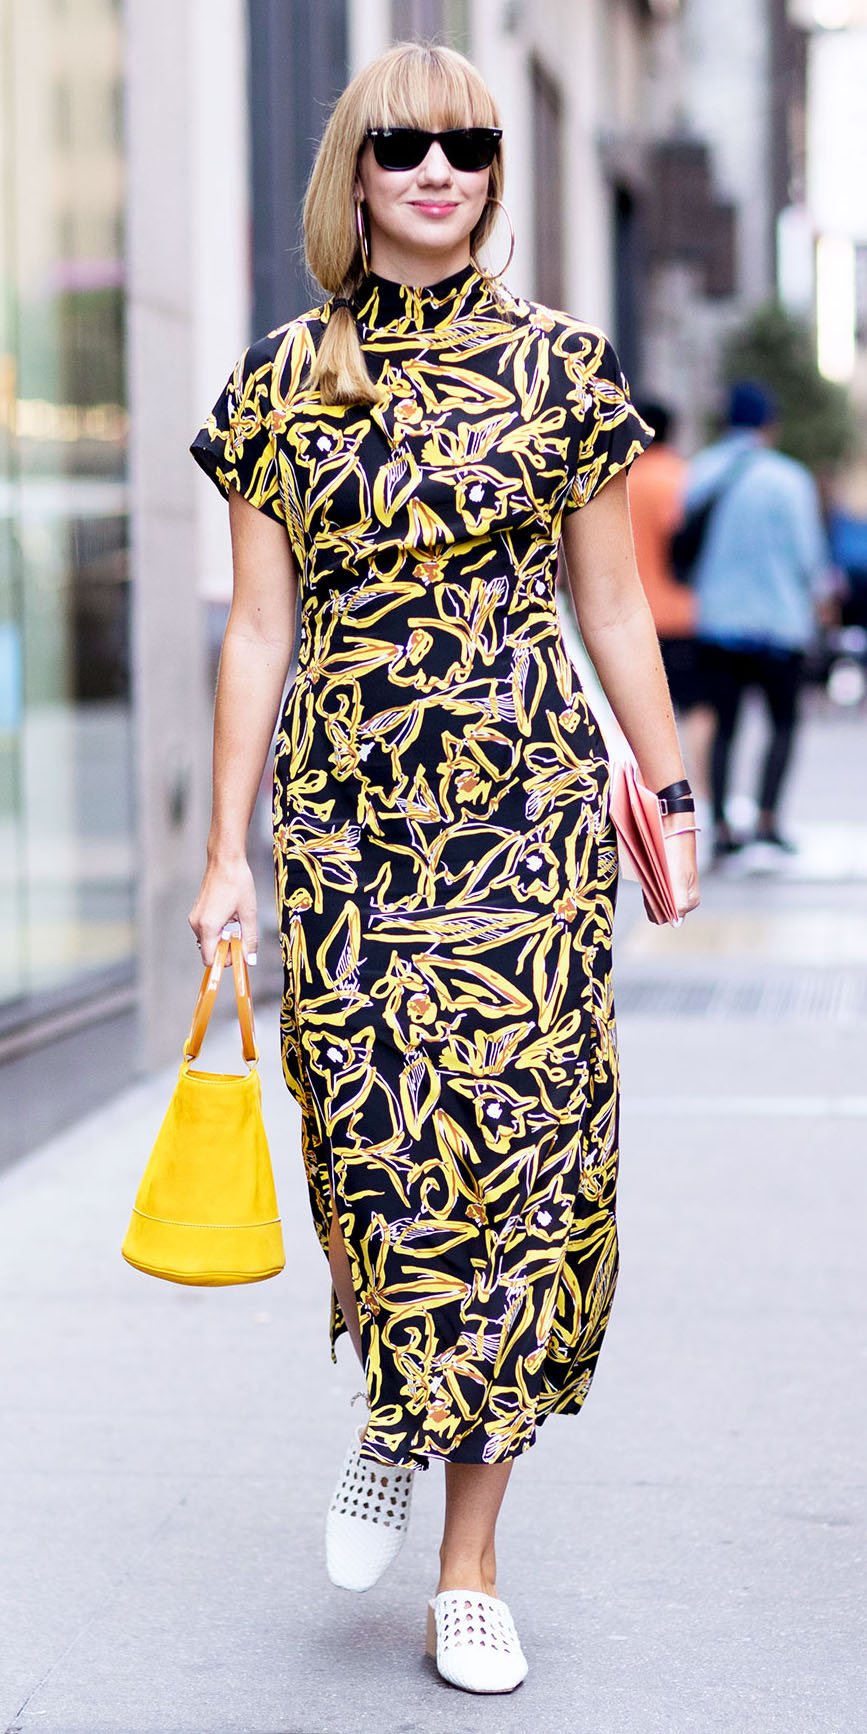 yellow-dress-midi-print-white-shoe-pumps-yellow-bag-sun-blonde-spring-summer-lunch.jpg